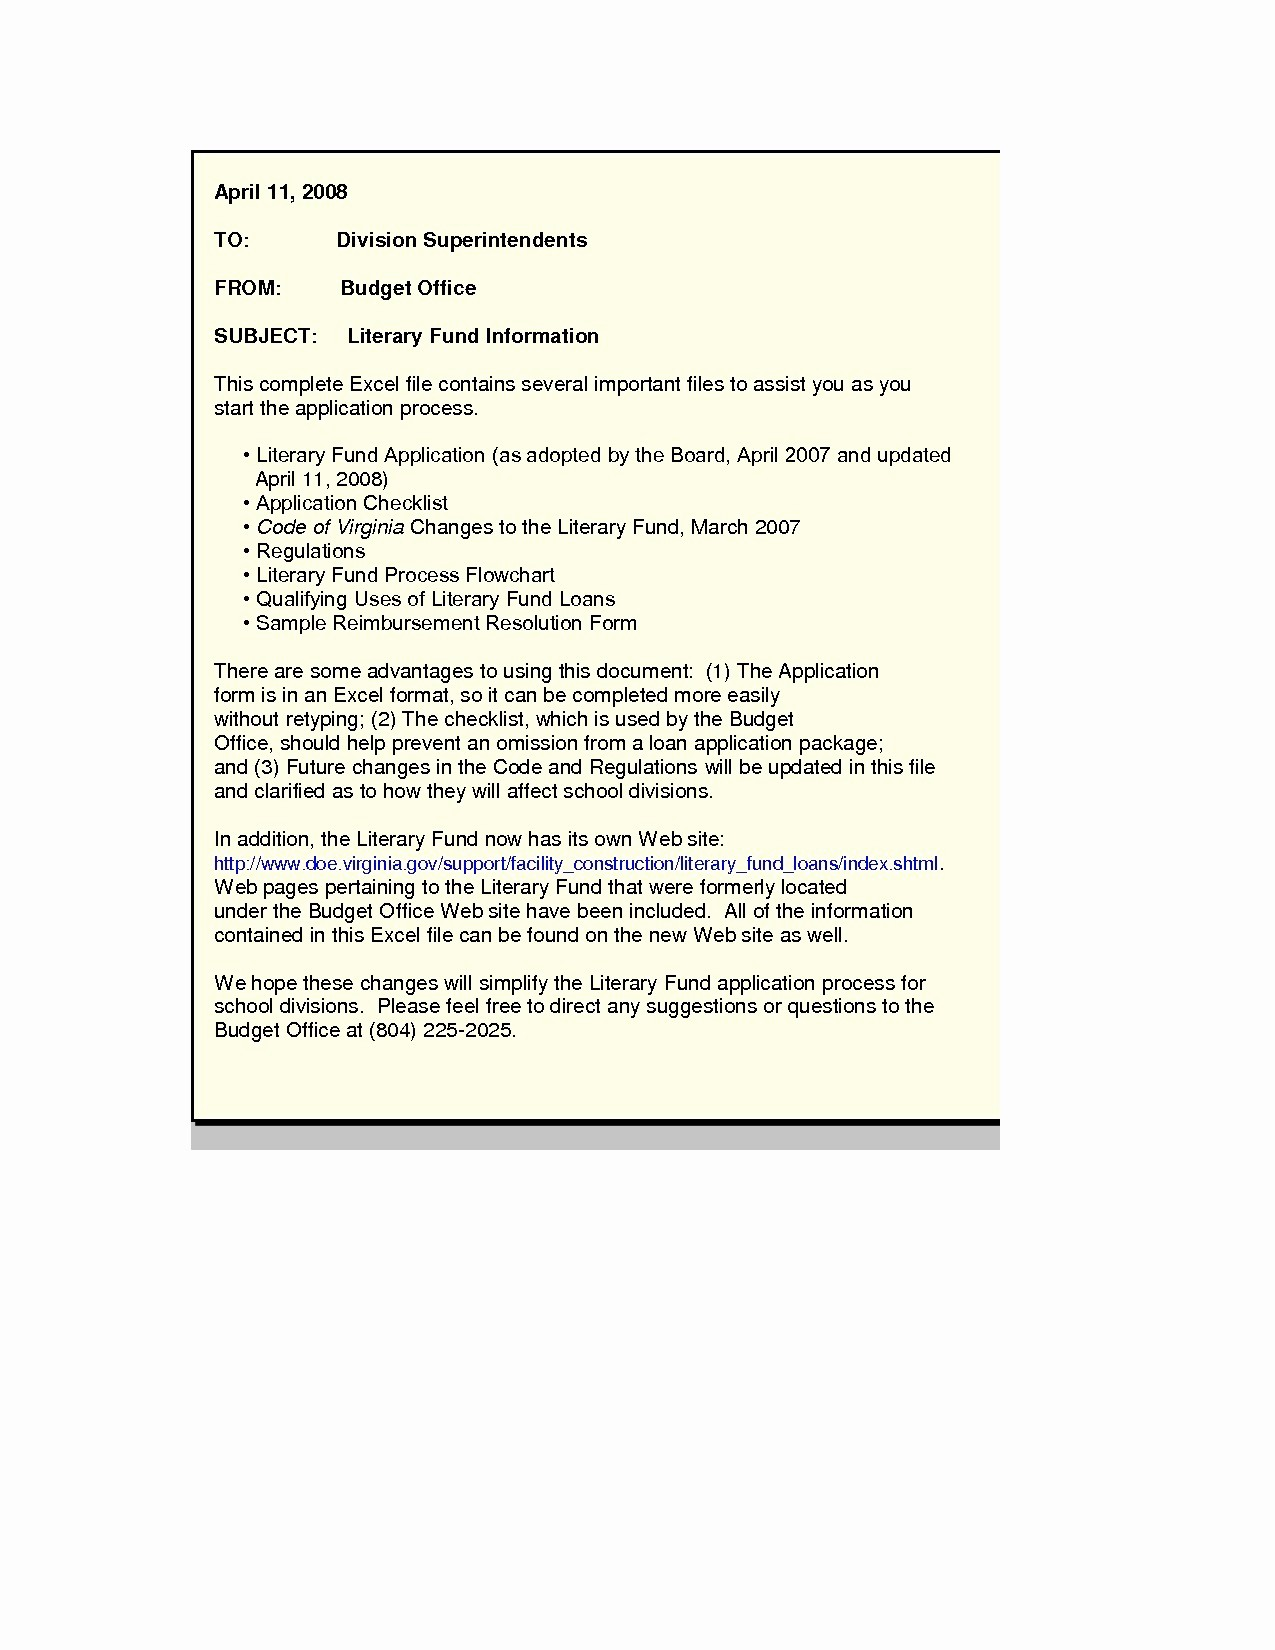 Invitation to Bid Template Construction Luxury Letter Invitation to Bid Template New Invitation to Bid